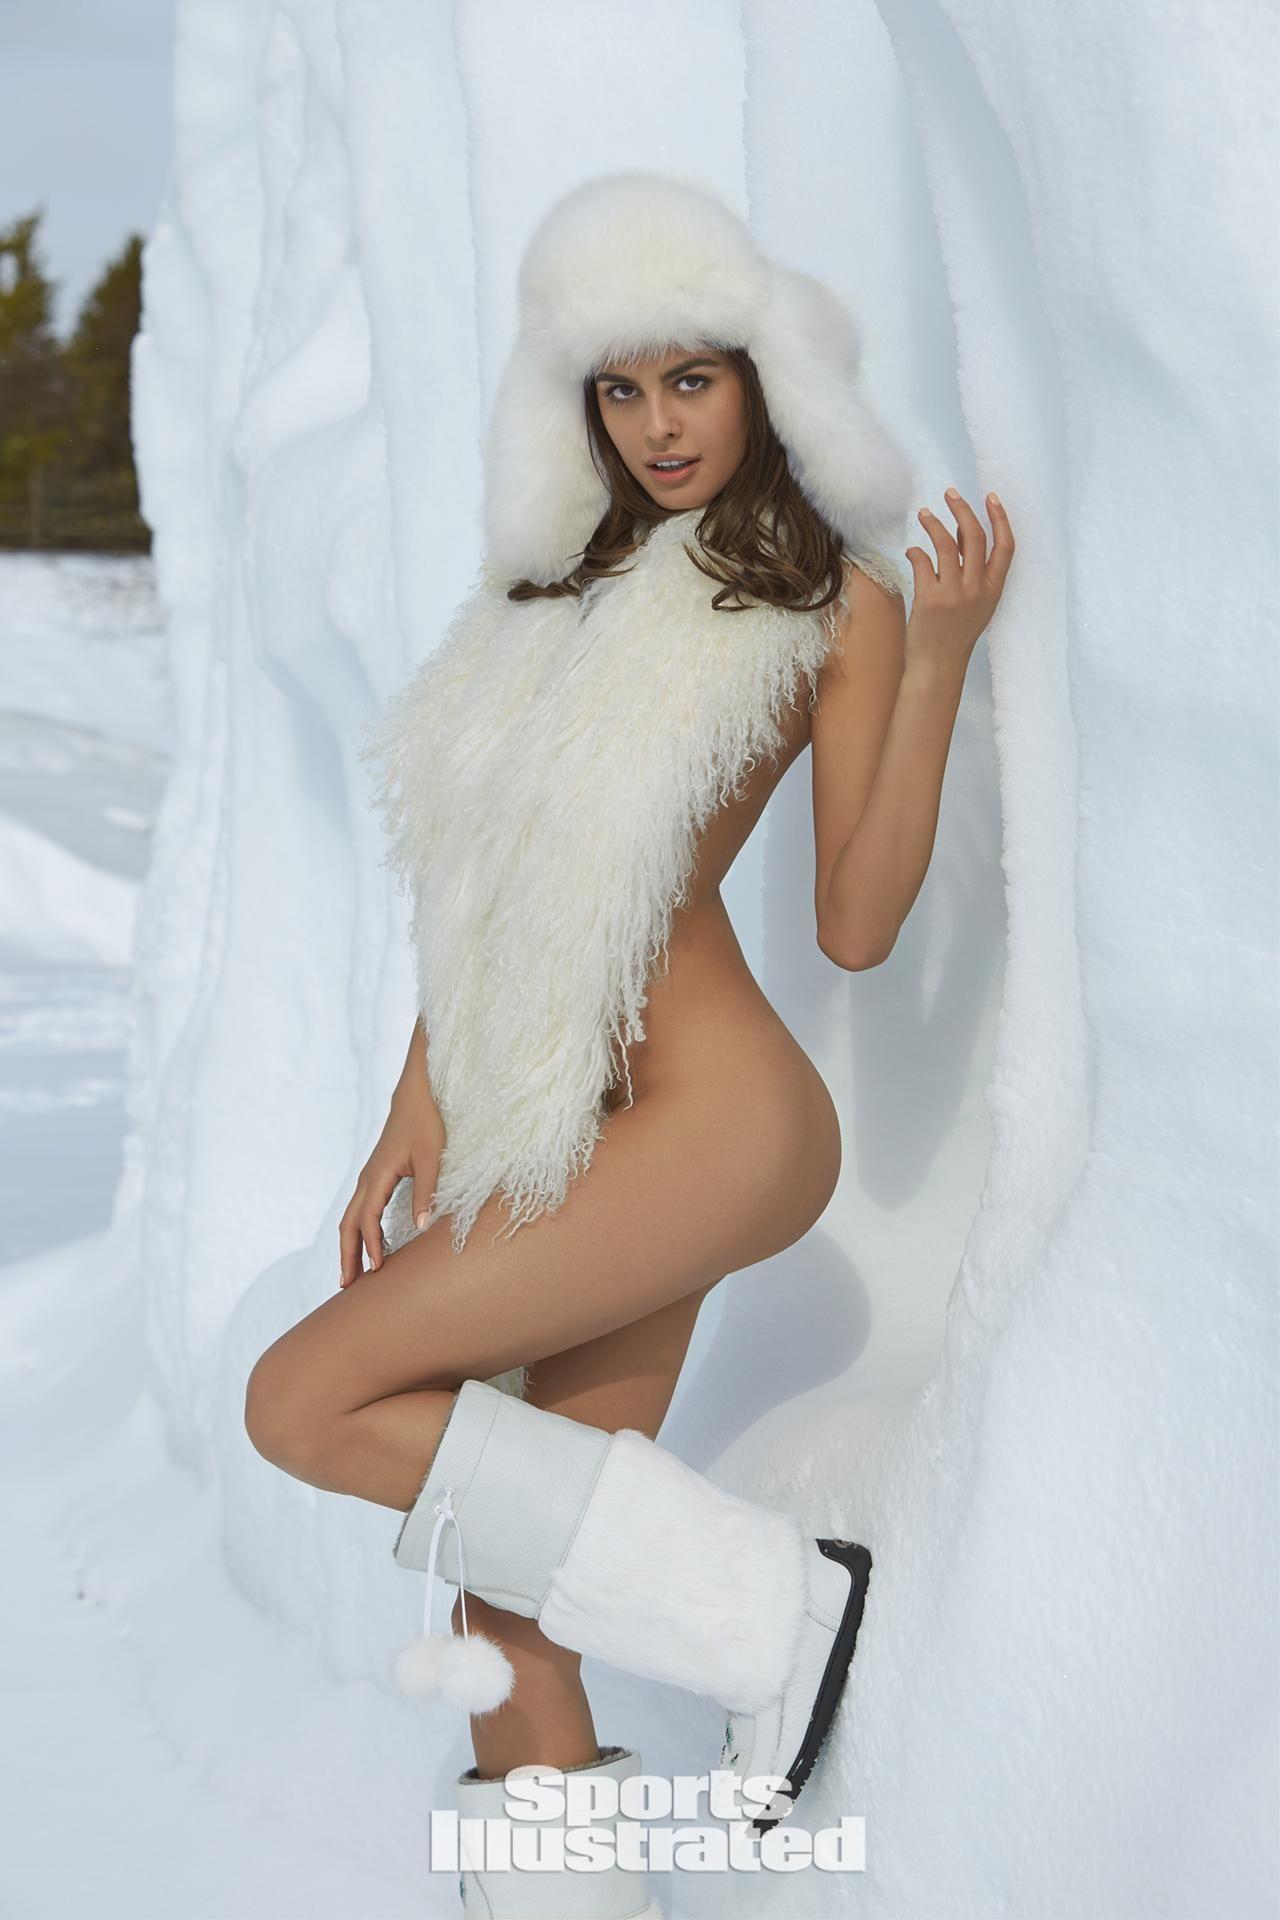 Revista Sport Illustrated Snow(Foto: Divulgação)